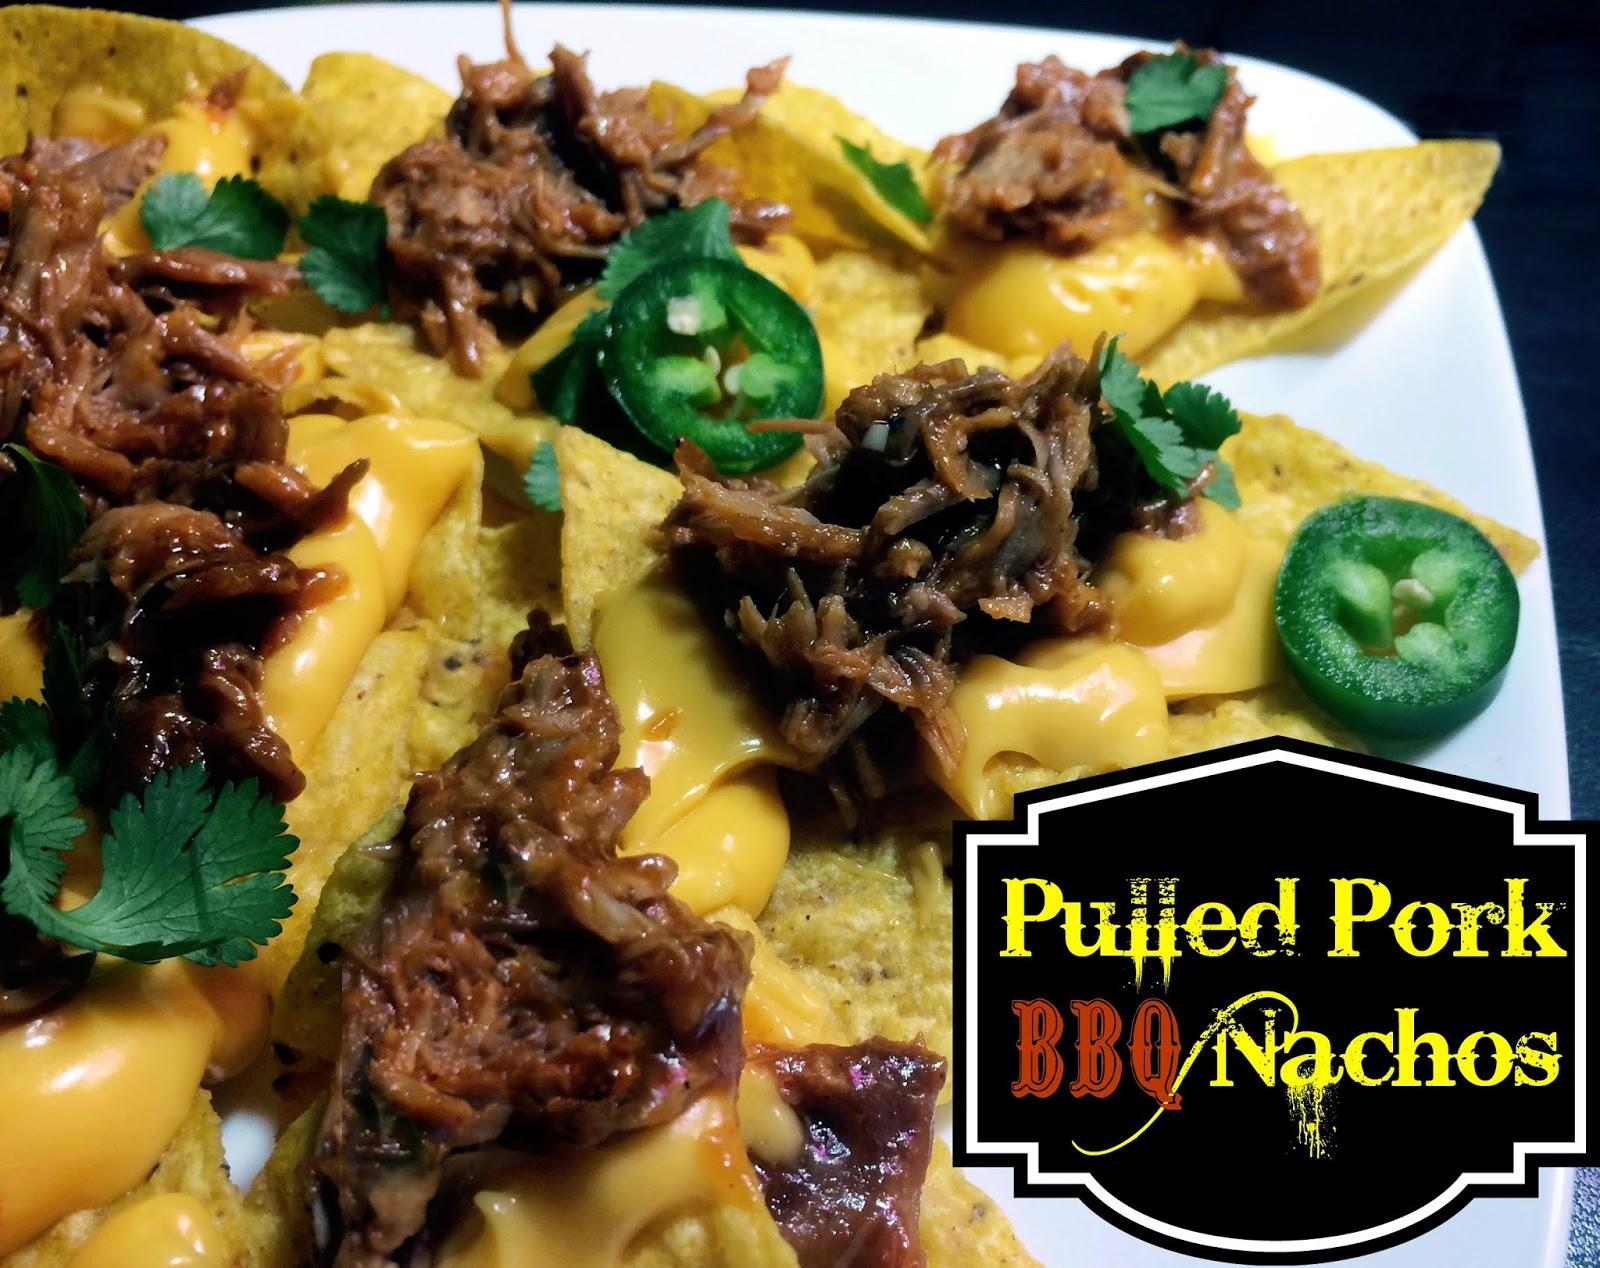 Pulled Pork Bbq Nachos Aunt Bee S Recipes